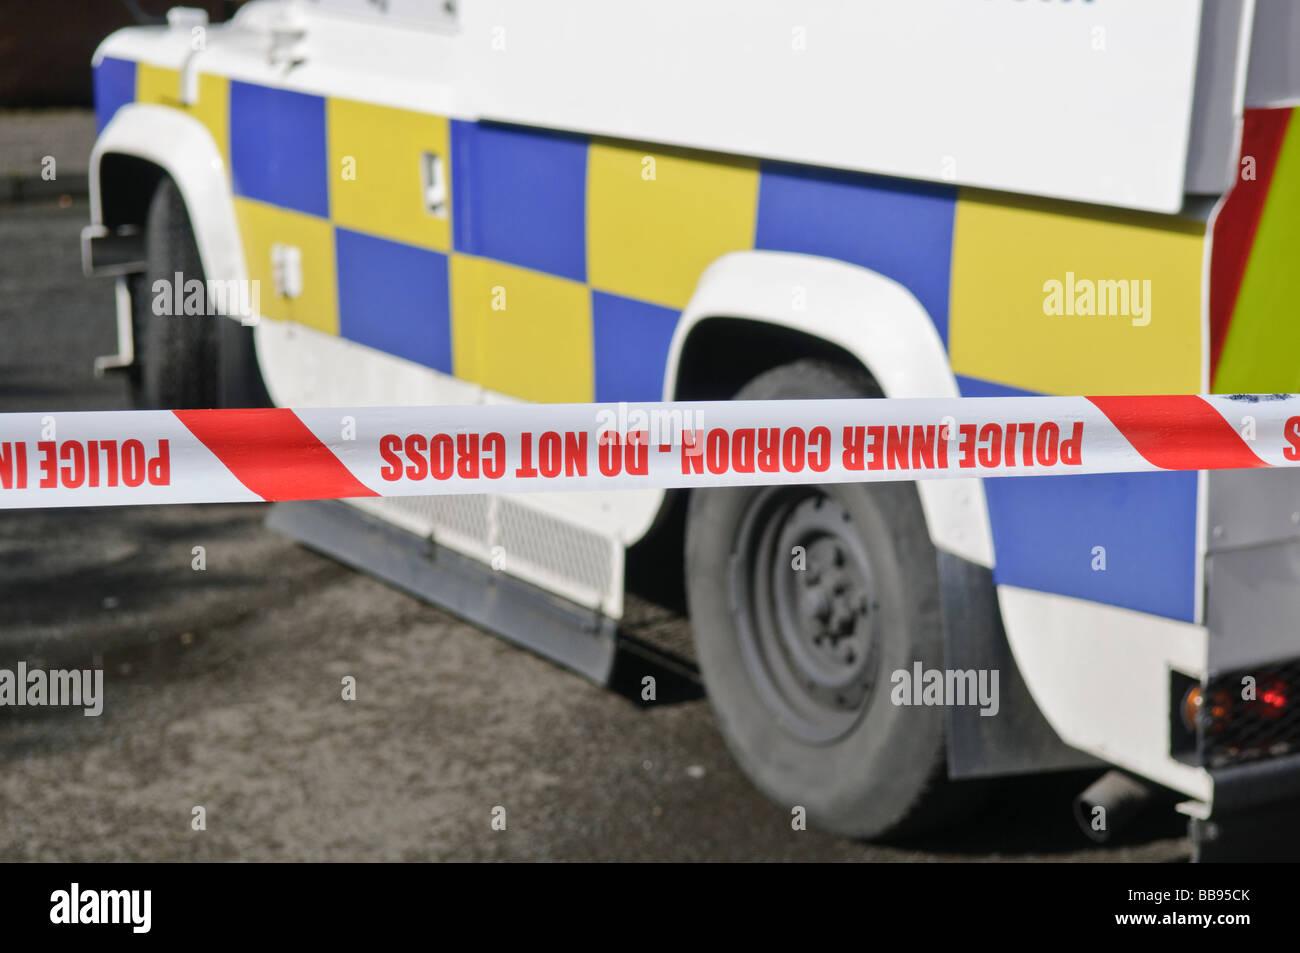 PSNI police landrover inside inner cordon at a scene of crime. - Stock Image